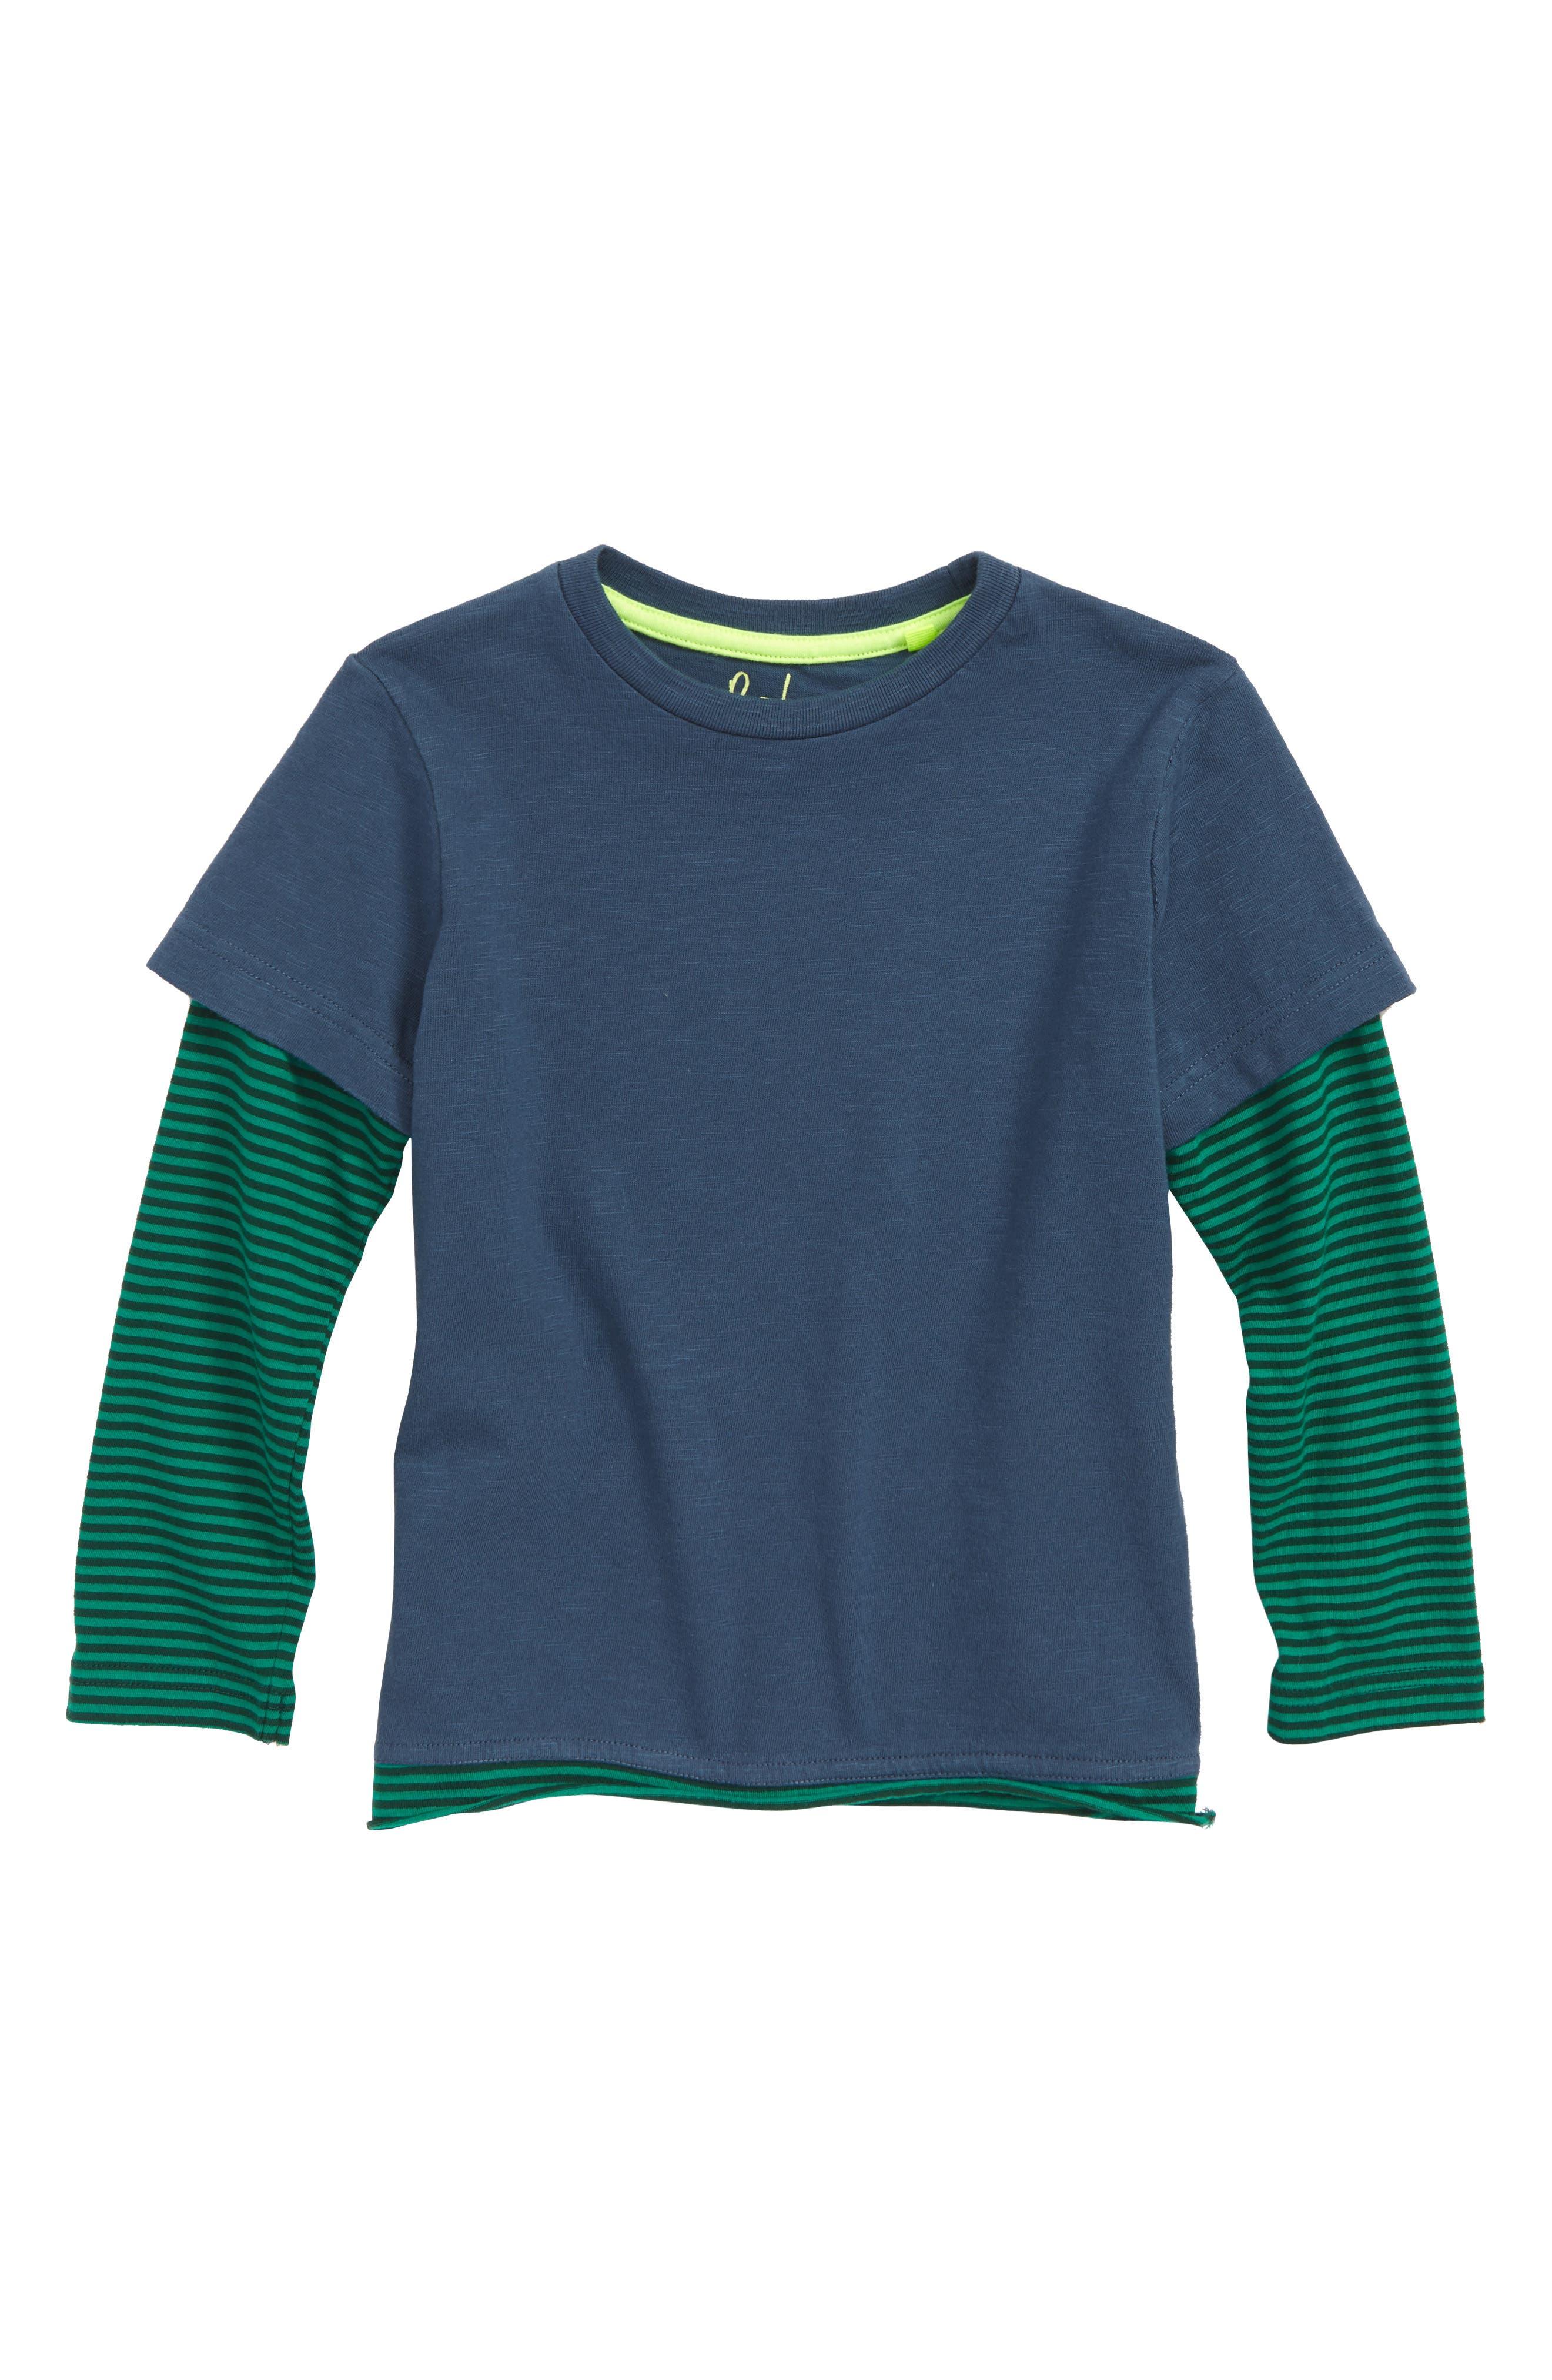 MINI BODEN Layered T-Shirt, Main, color, 424